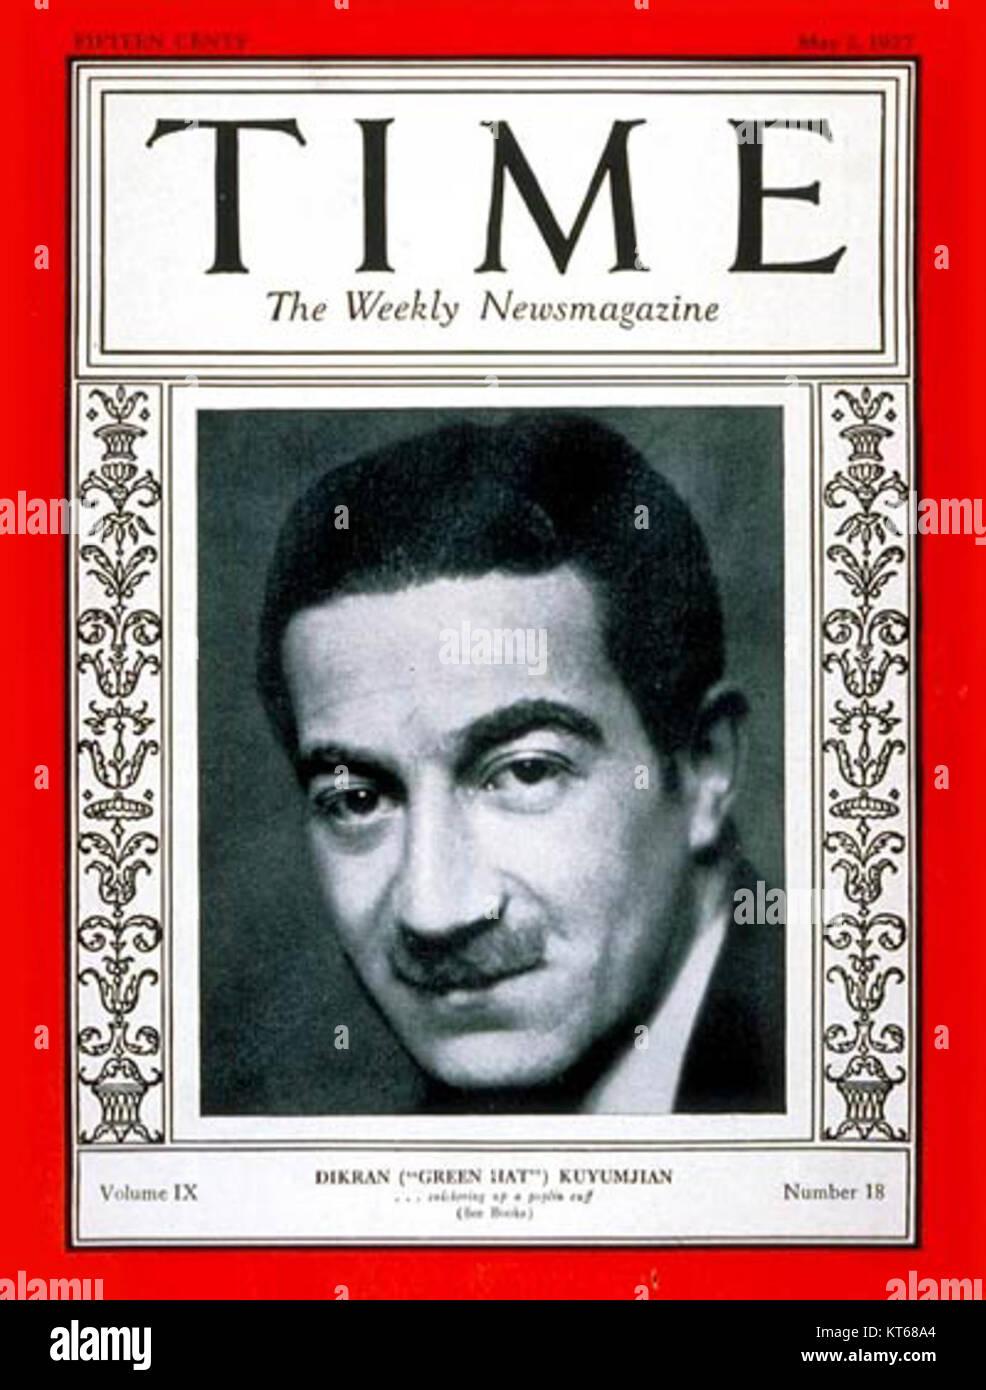 Time-magazine-cover-michael-arlen - Stock Image